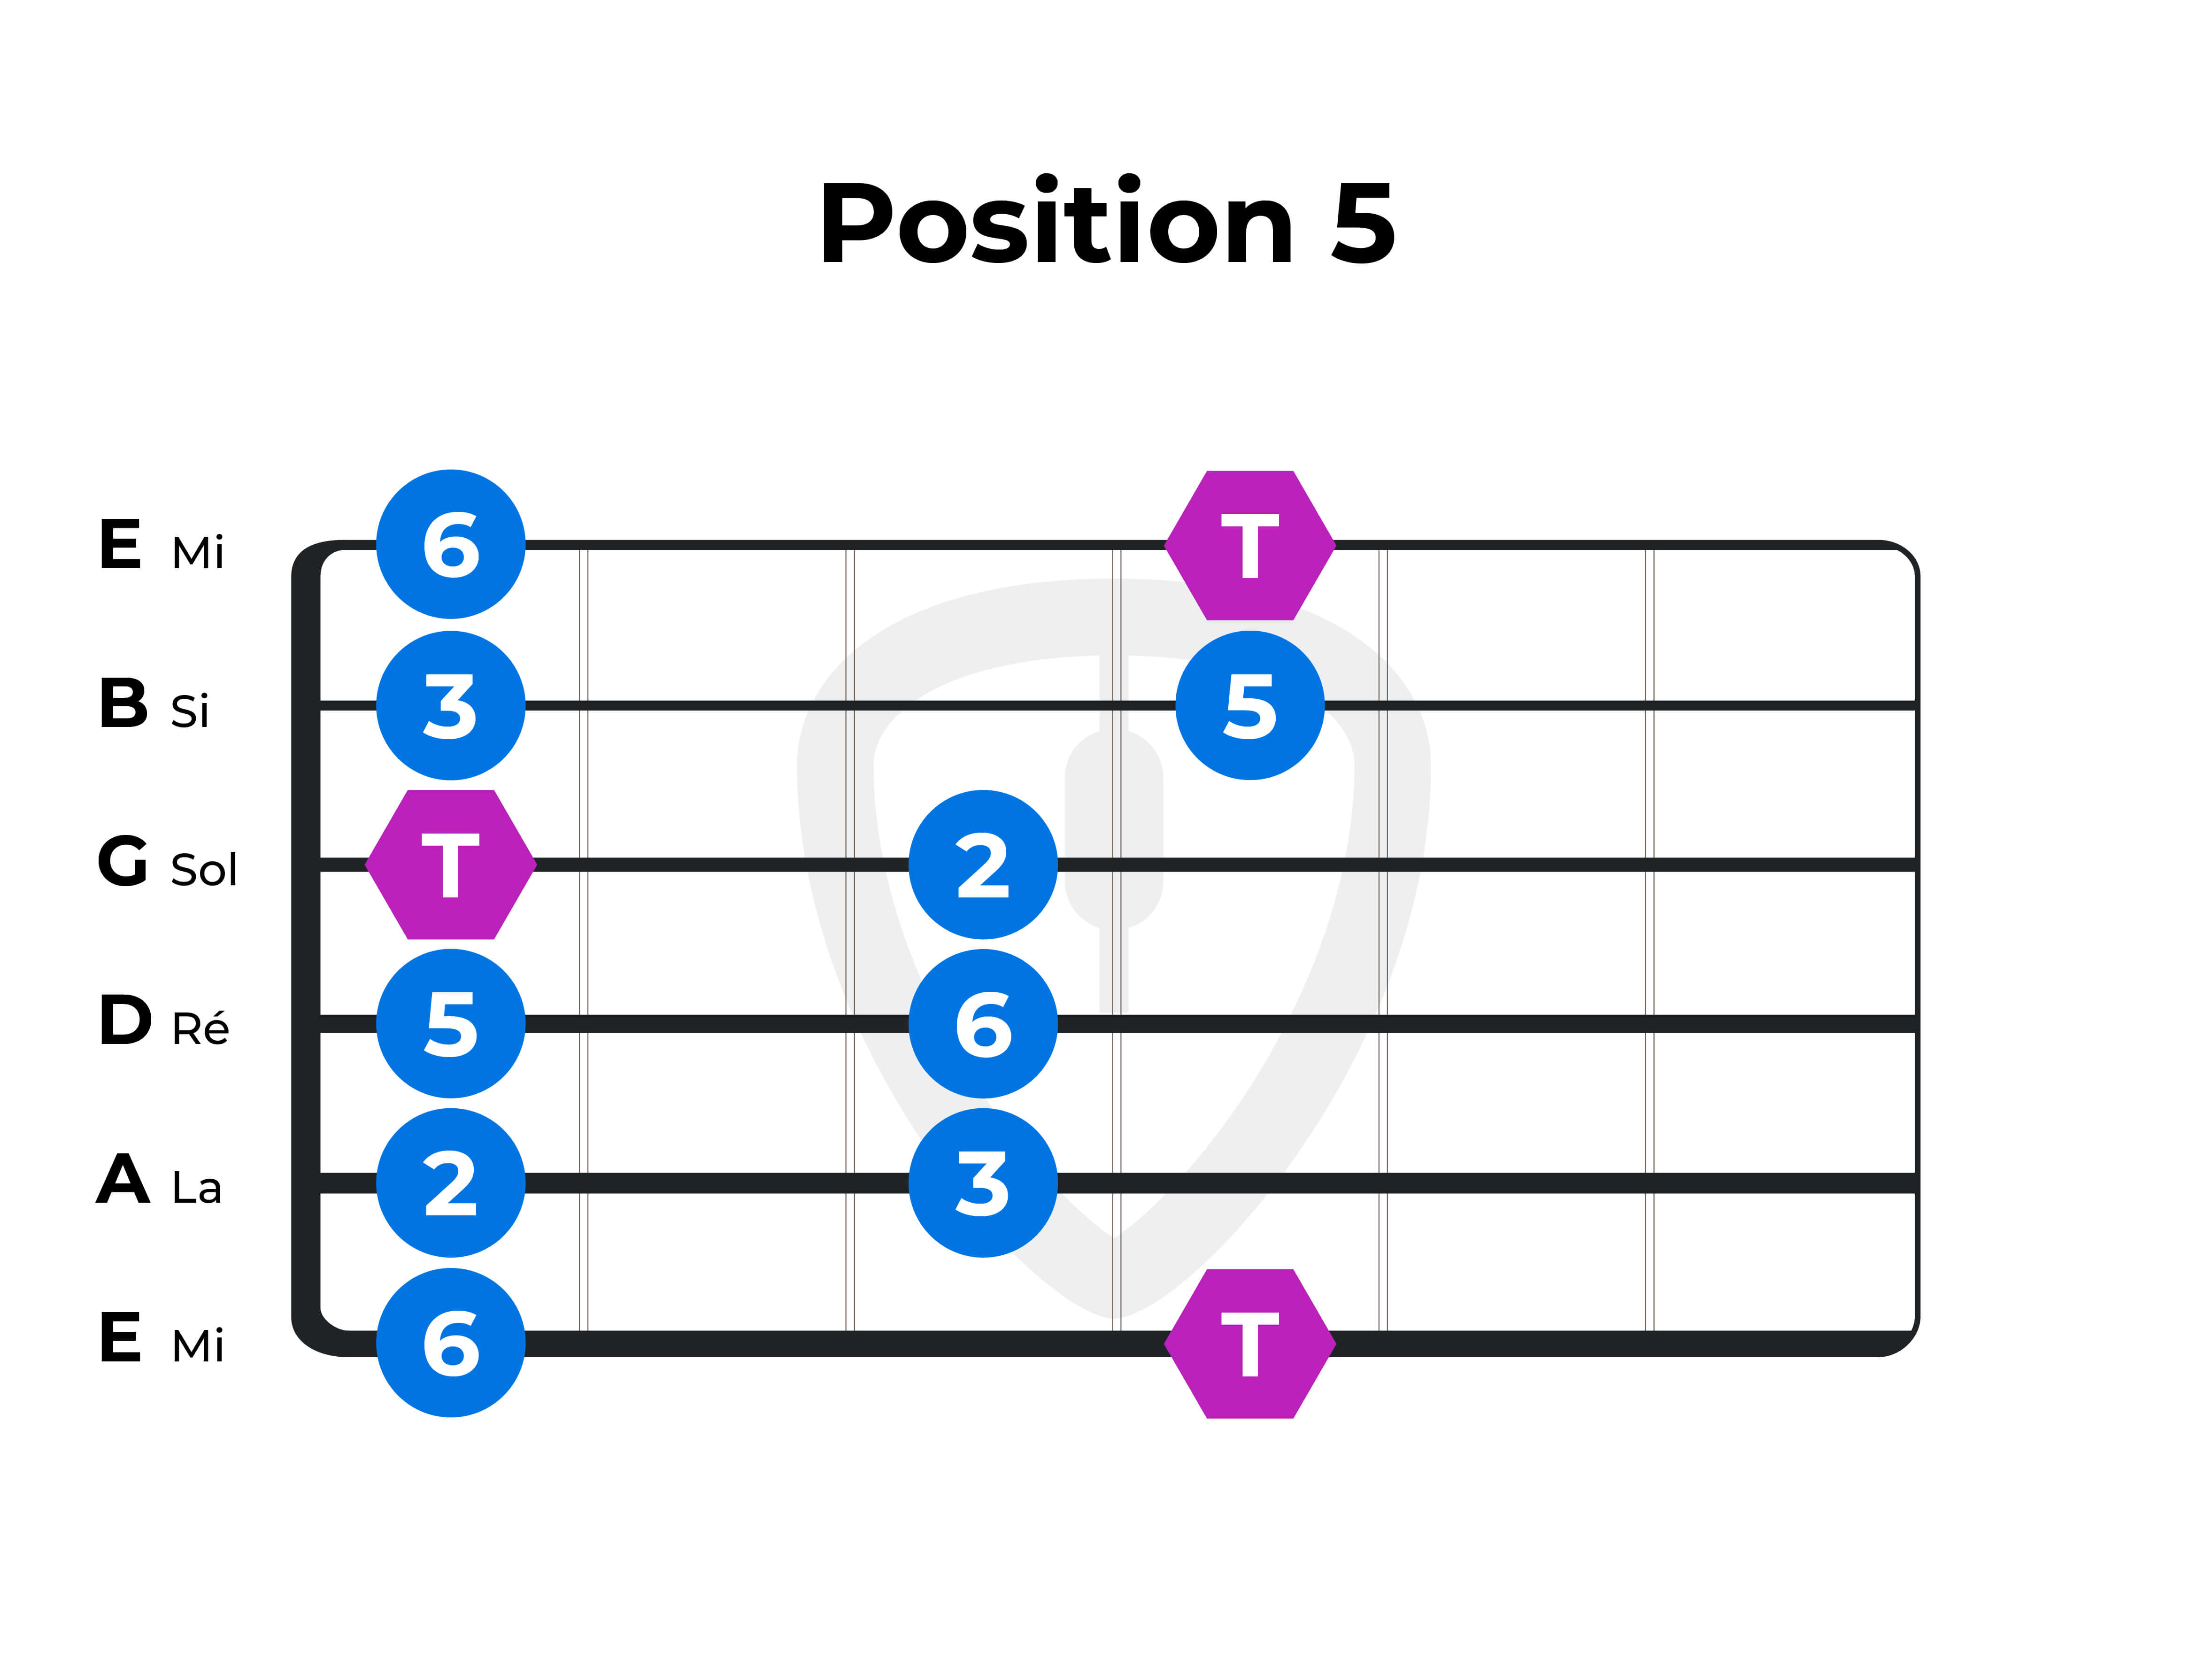 gamme pentatonique majeure guitare position 5